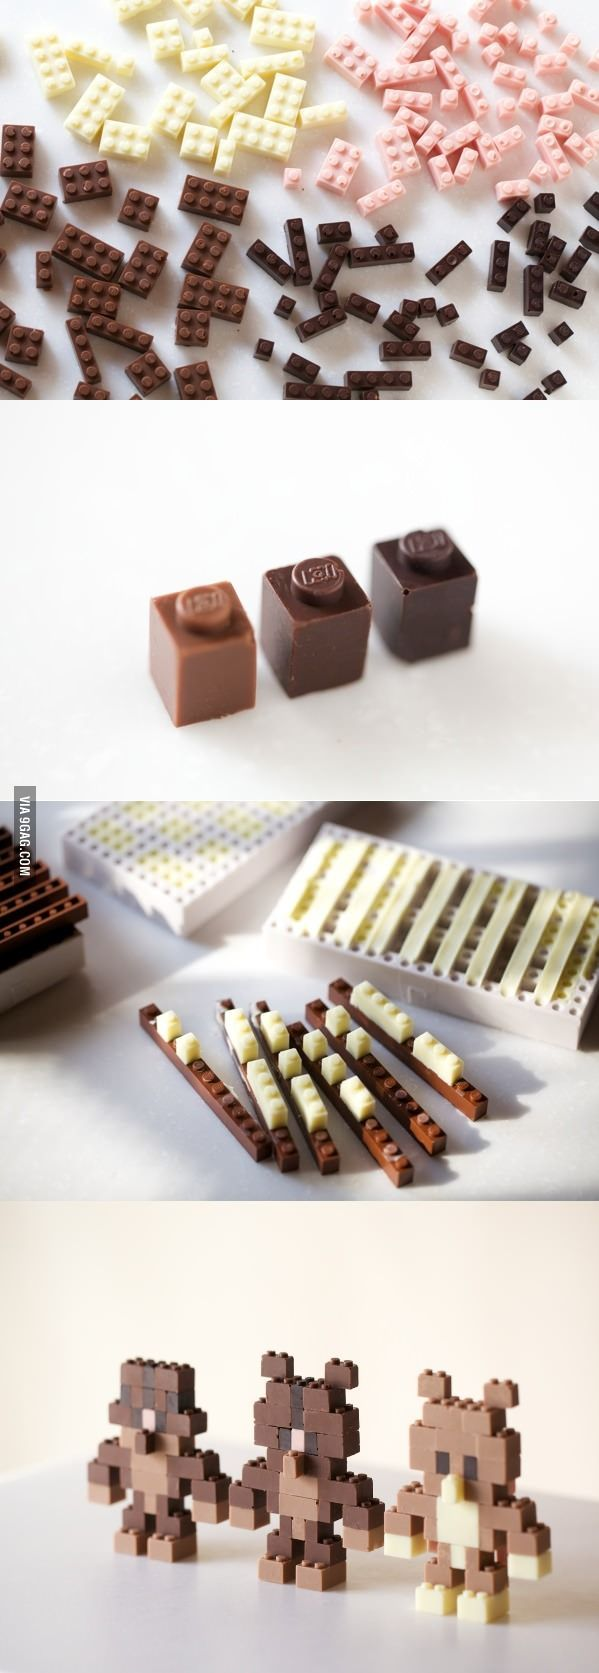 Best Chocolate Lego Ideas On Pinterest Lego Ice Cube Tray - Amazing edible lego chocolate stuff dreams made